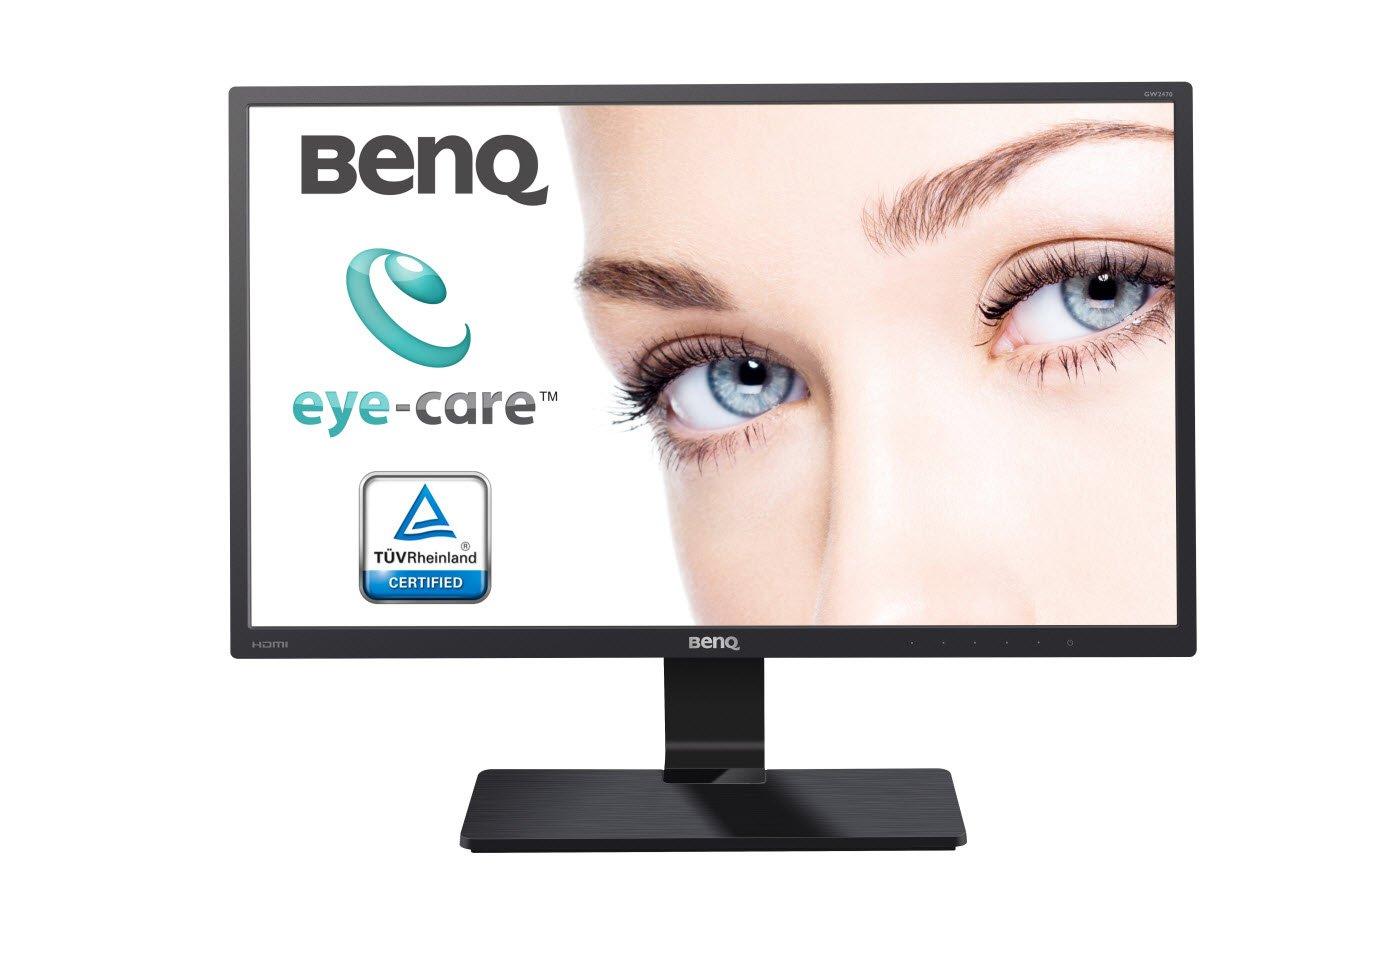 "BenQ GW2270 - Monitor LED Eye-Care de 21.5"" (1920 x 1080, VGA/DVI, Low Blue Light, Flicker-free), color negro"